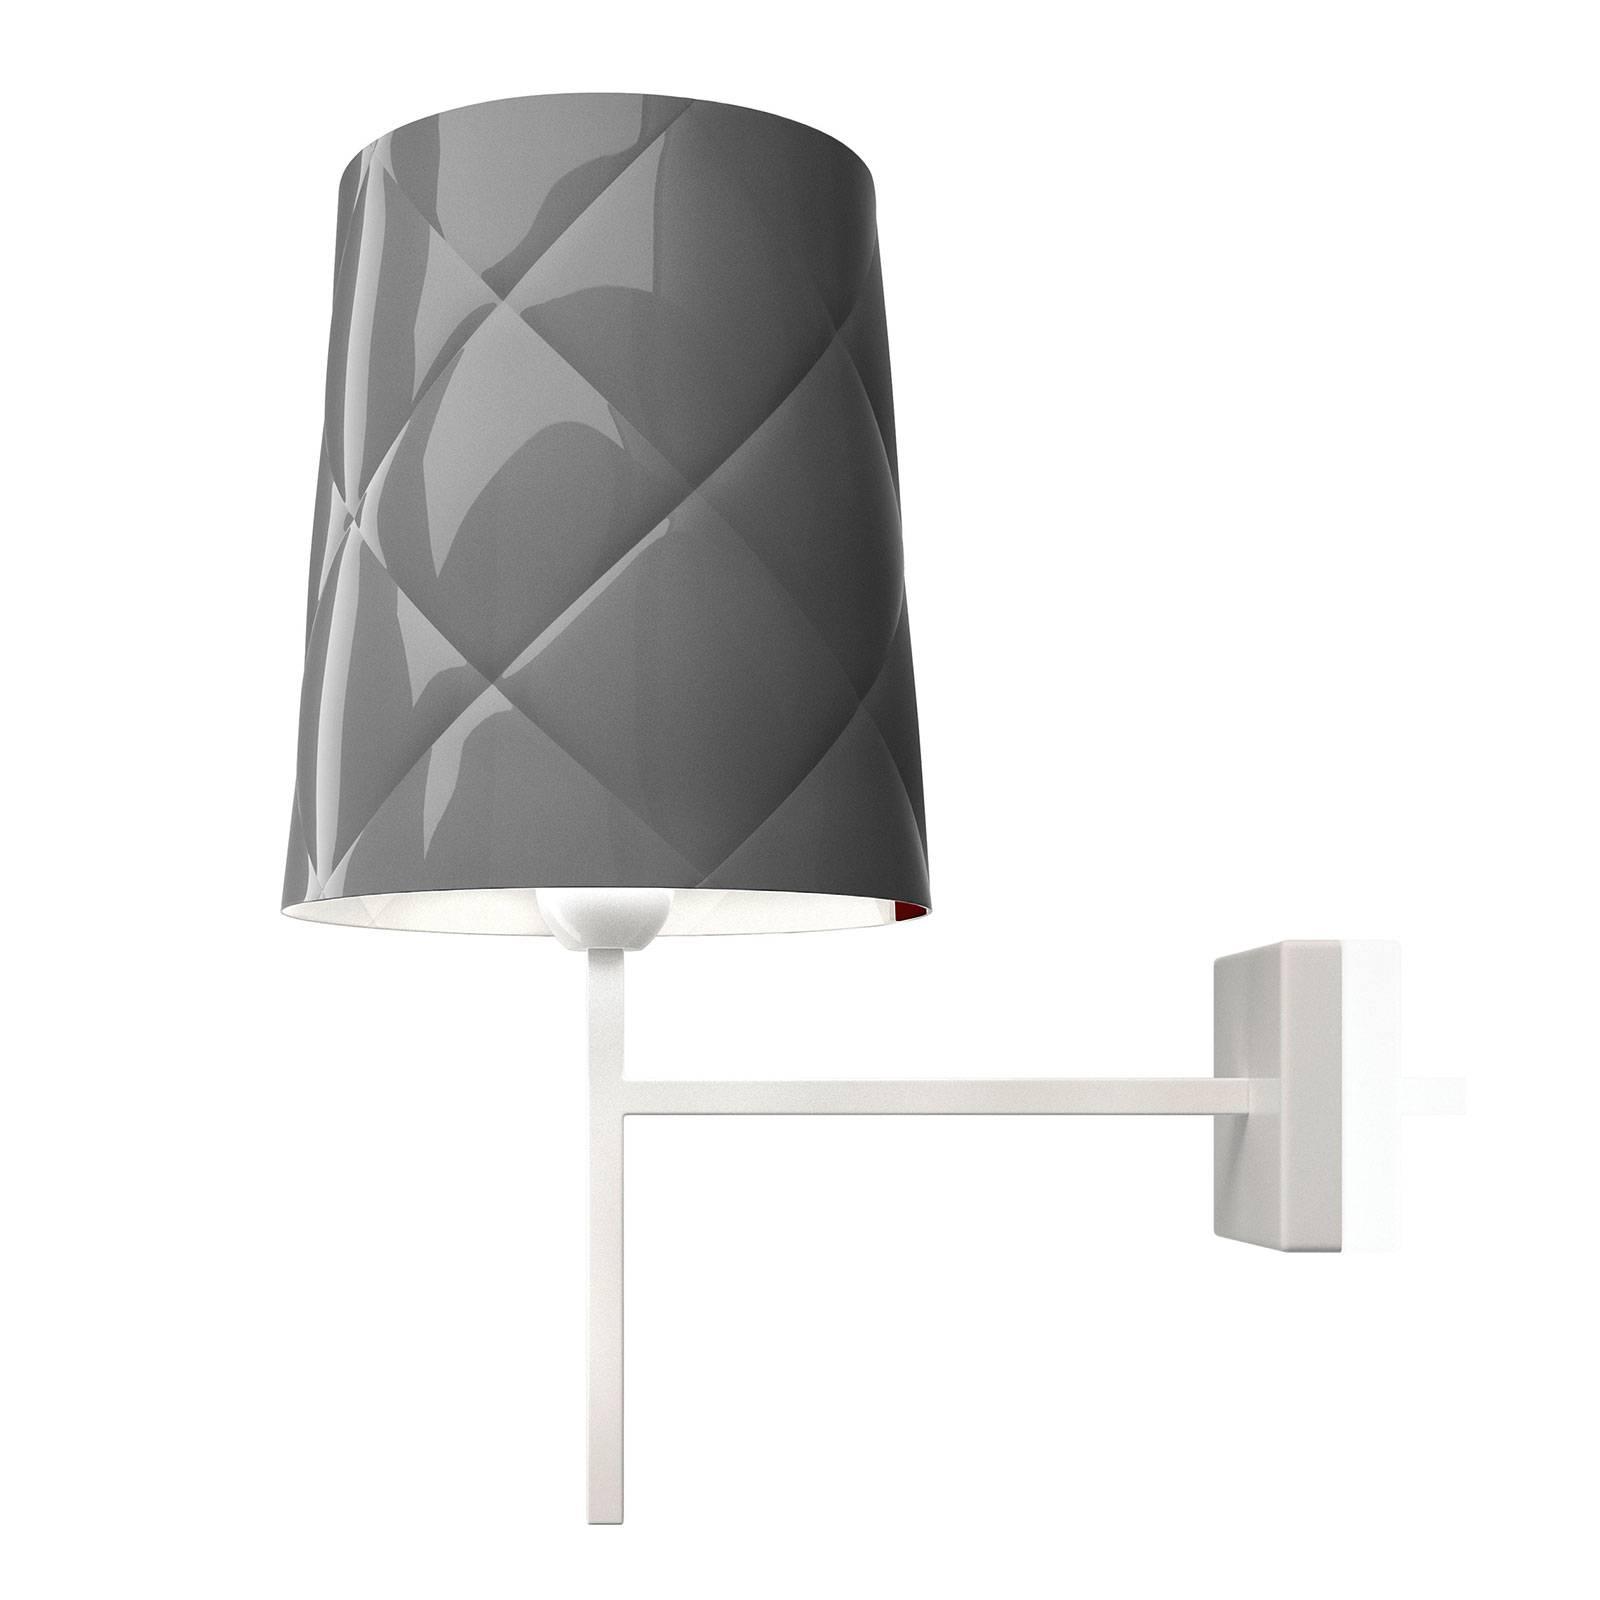 Kundalini New York wandlamp, grijs